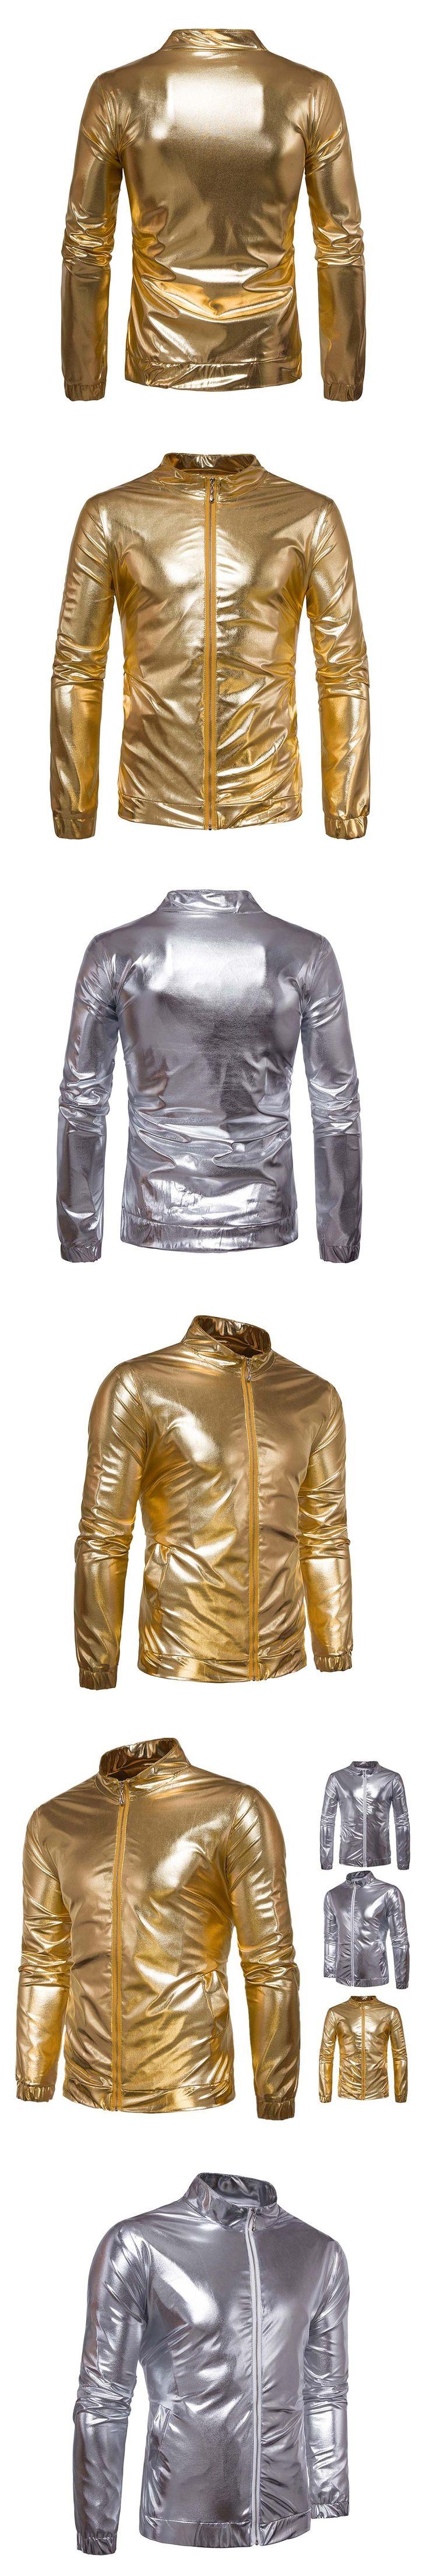 Fashion Men Shiny Jacket Coated Metallic Hip Hop Jackets Night Club Wear Outerwear Coat -MX8